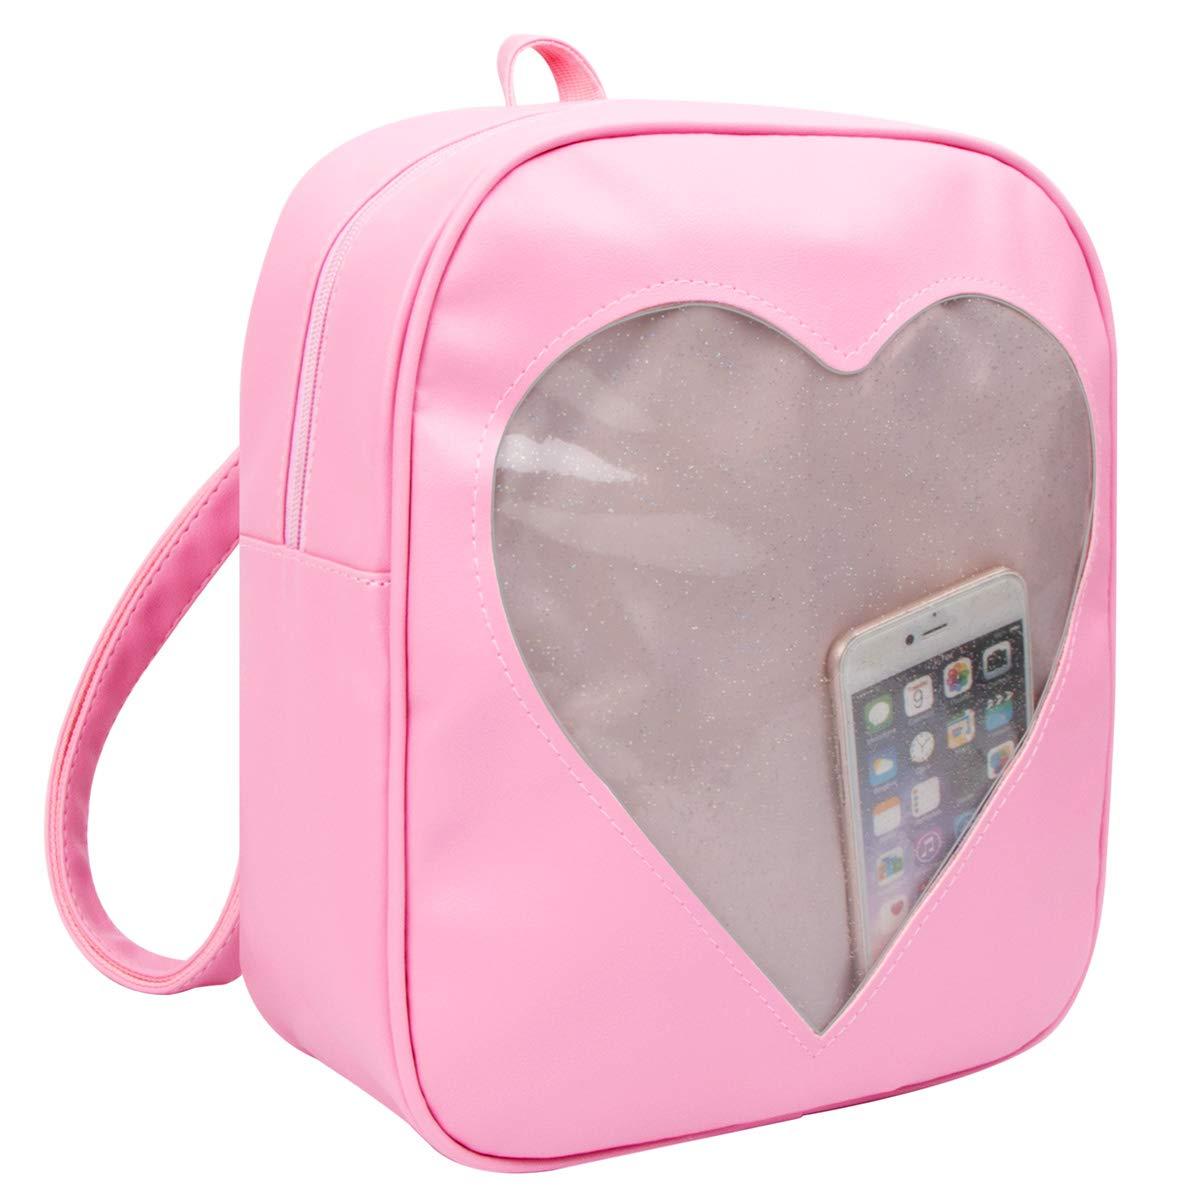 xhorizon FL1 Candy Leather Backpack Transparent Heart Beach Girls School Bag 201610310526E